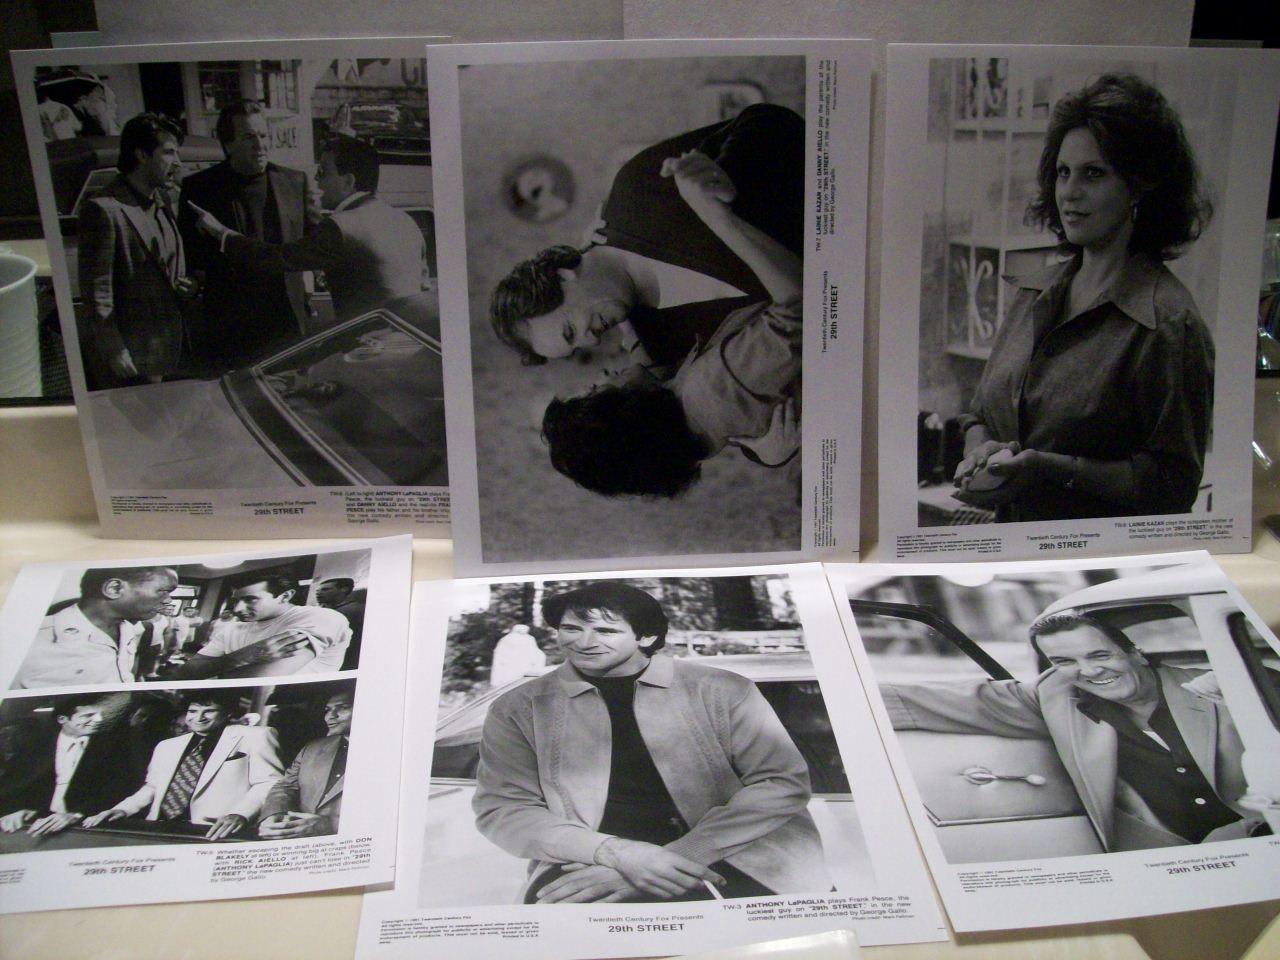 Aiello, Danny Anthony Lapaglia Lainie Kazan Press Kit Signed Autograph 29Th Street 1991